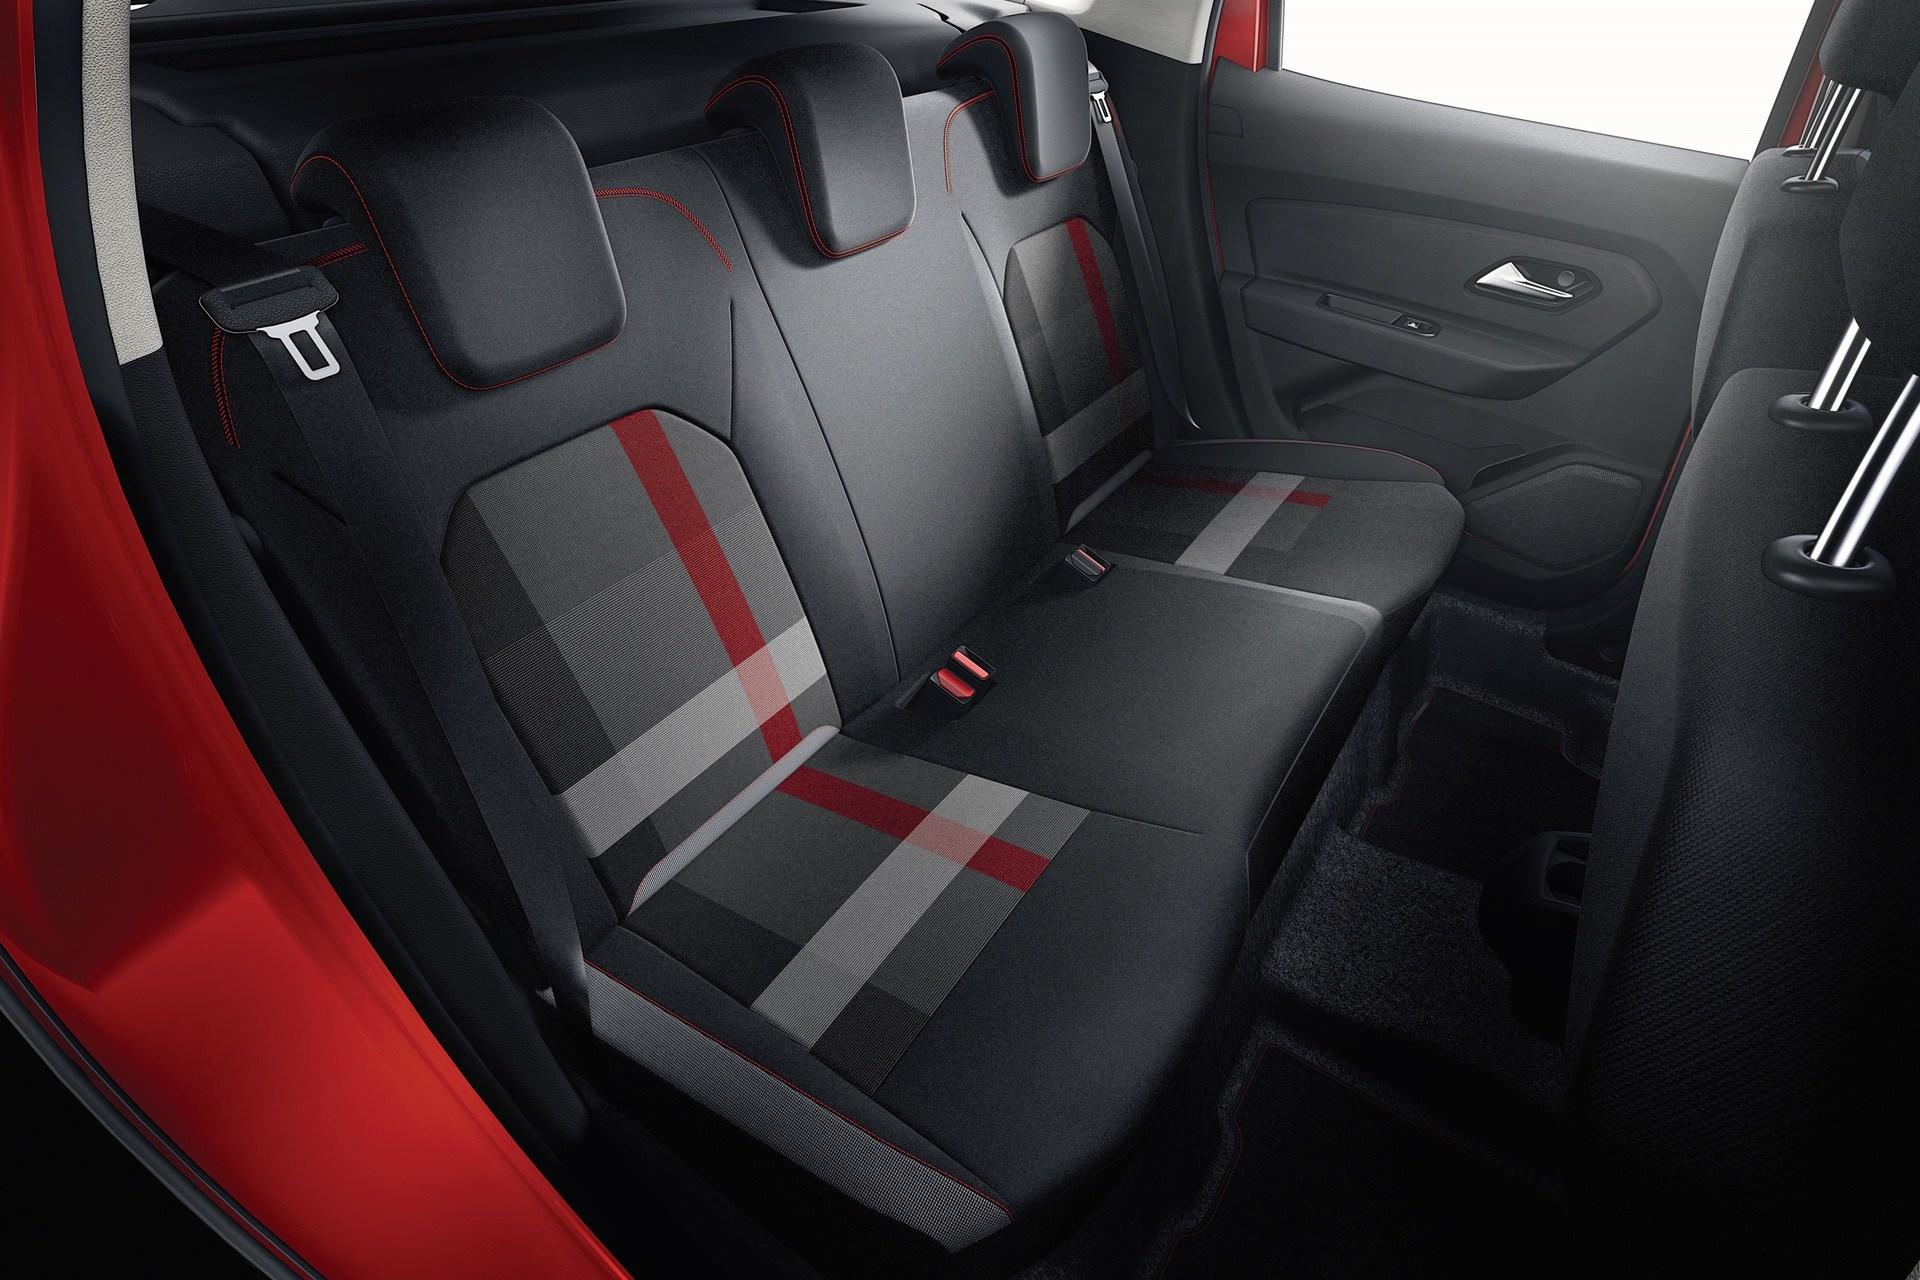 2019 - Dacia DUSTER Série Limitée Ultimate (ou Techroad)